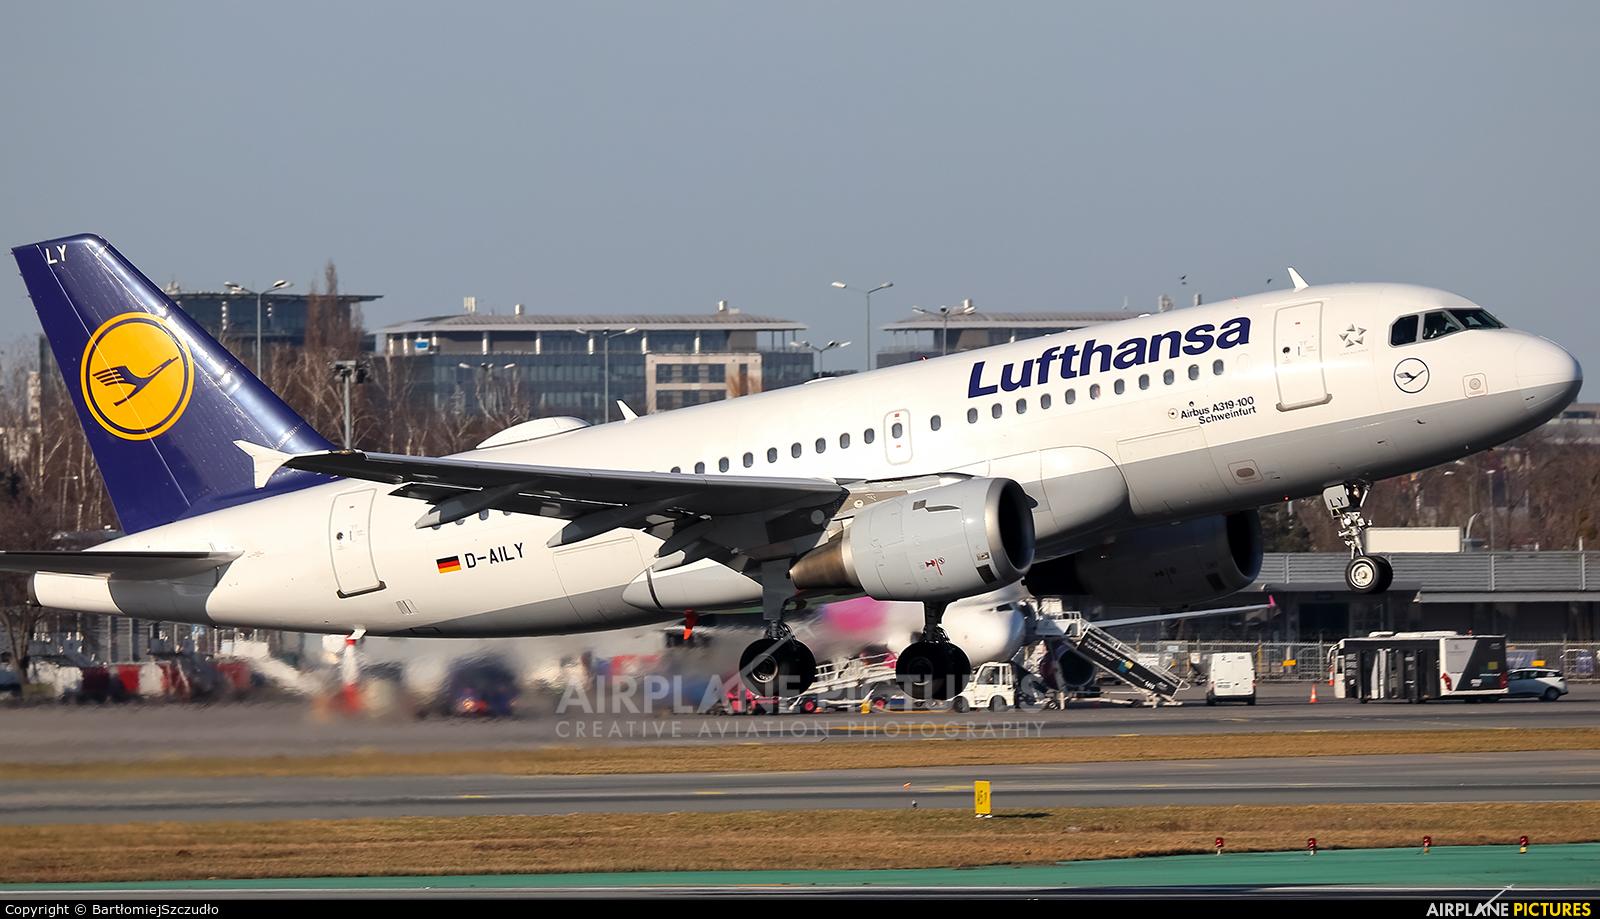 Lufthansa D-AILY aircraft at Warsaw - Frederic Chopin